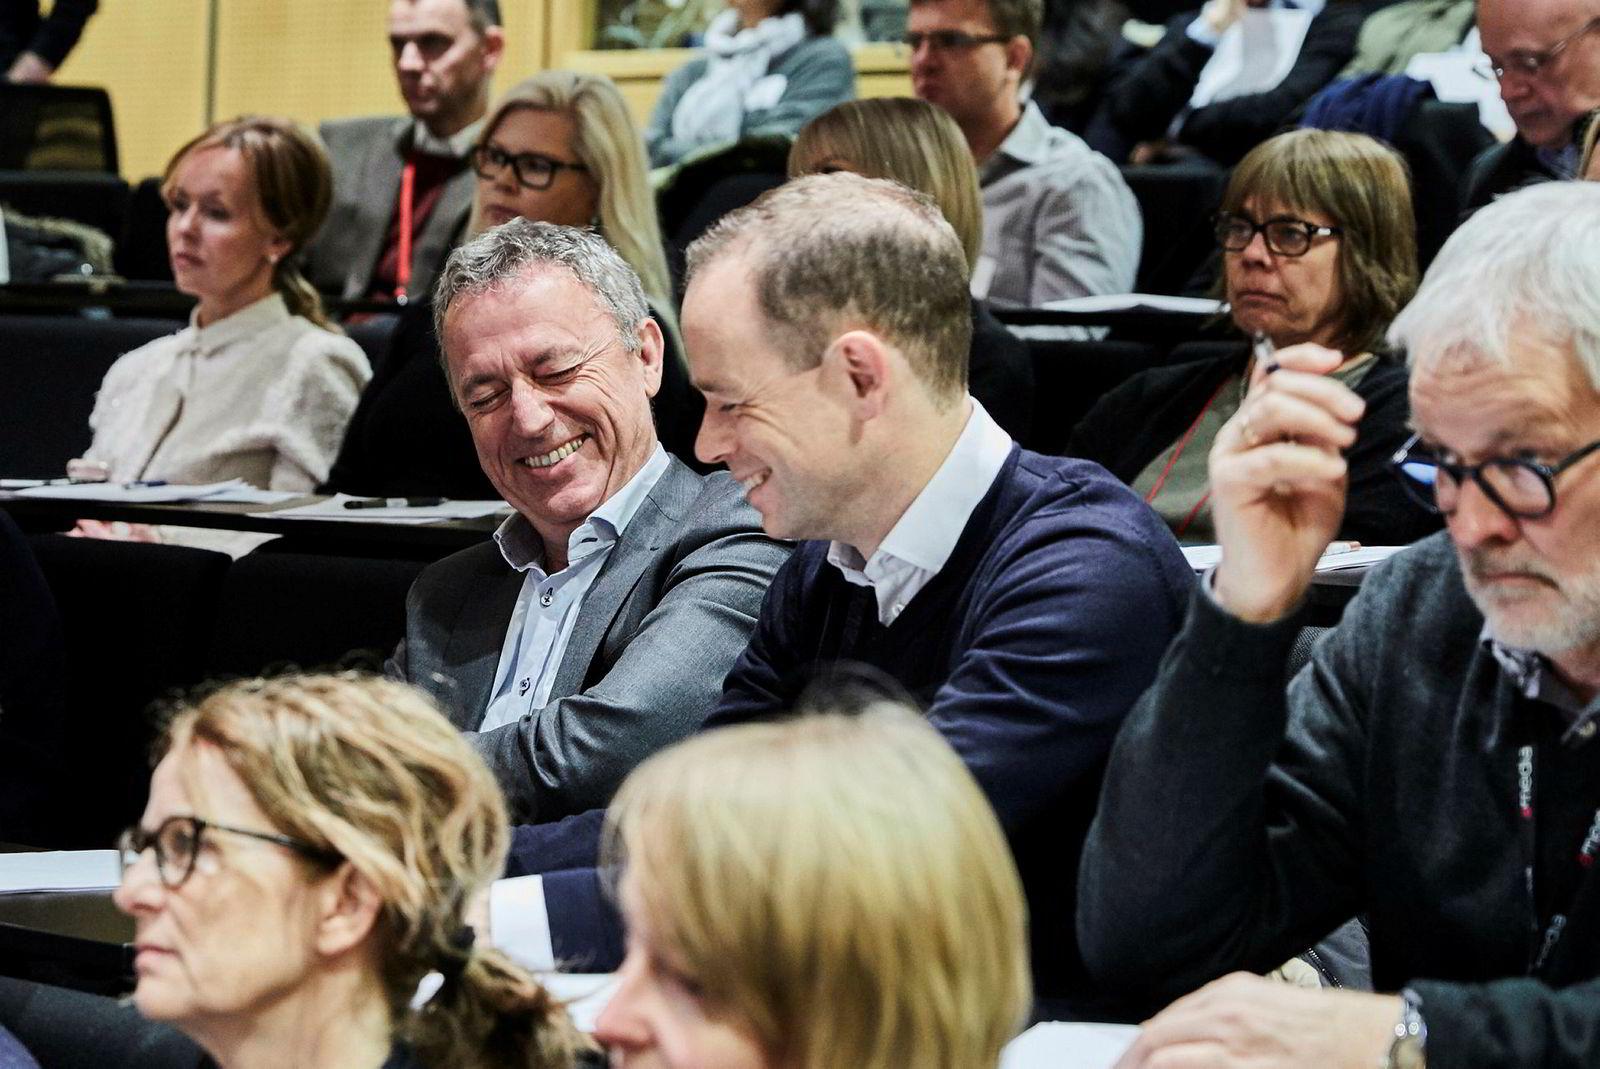 Konsernsjef Are Stokstad og økonomidirektør Gisle Torheim i Amedia la fredag frem konsernets årsresultat.